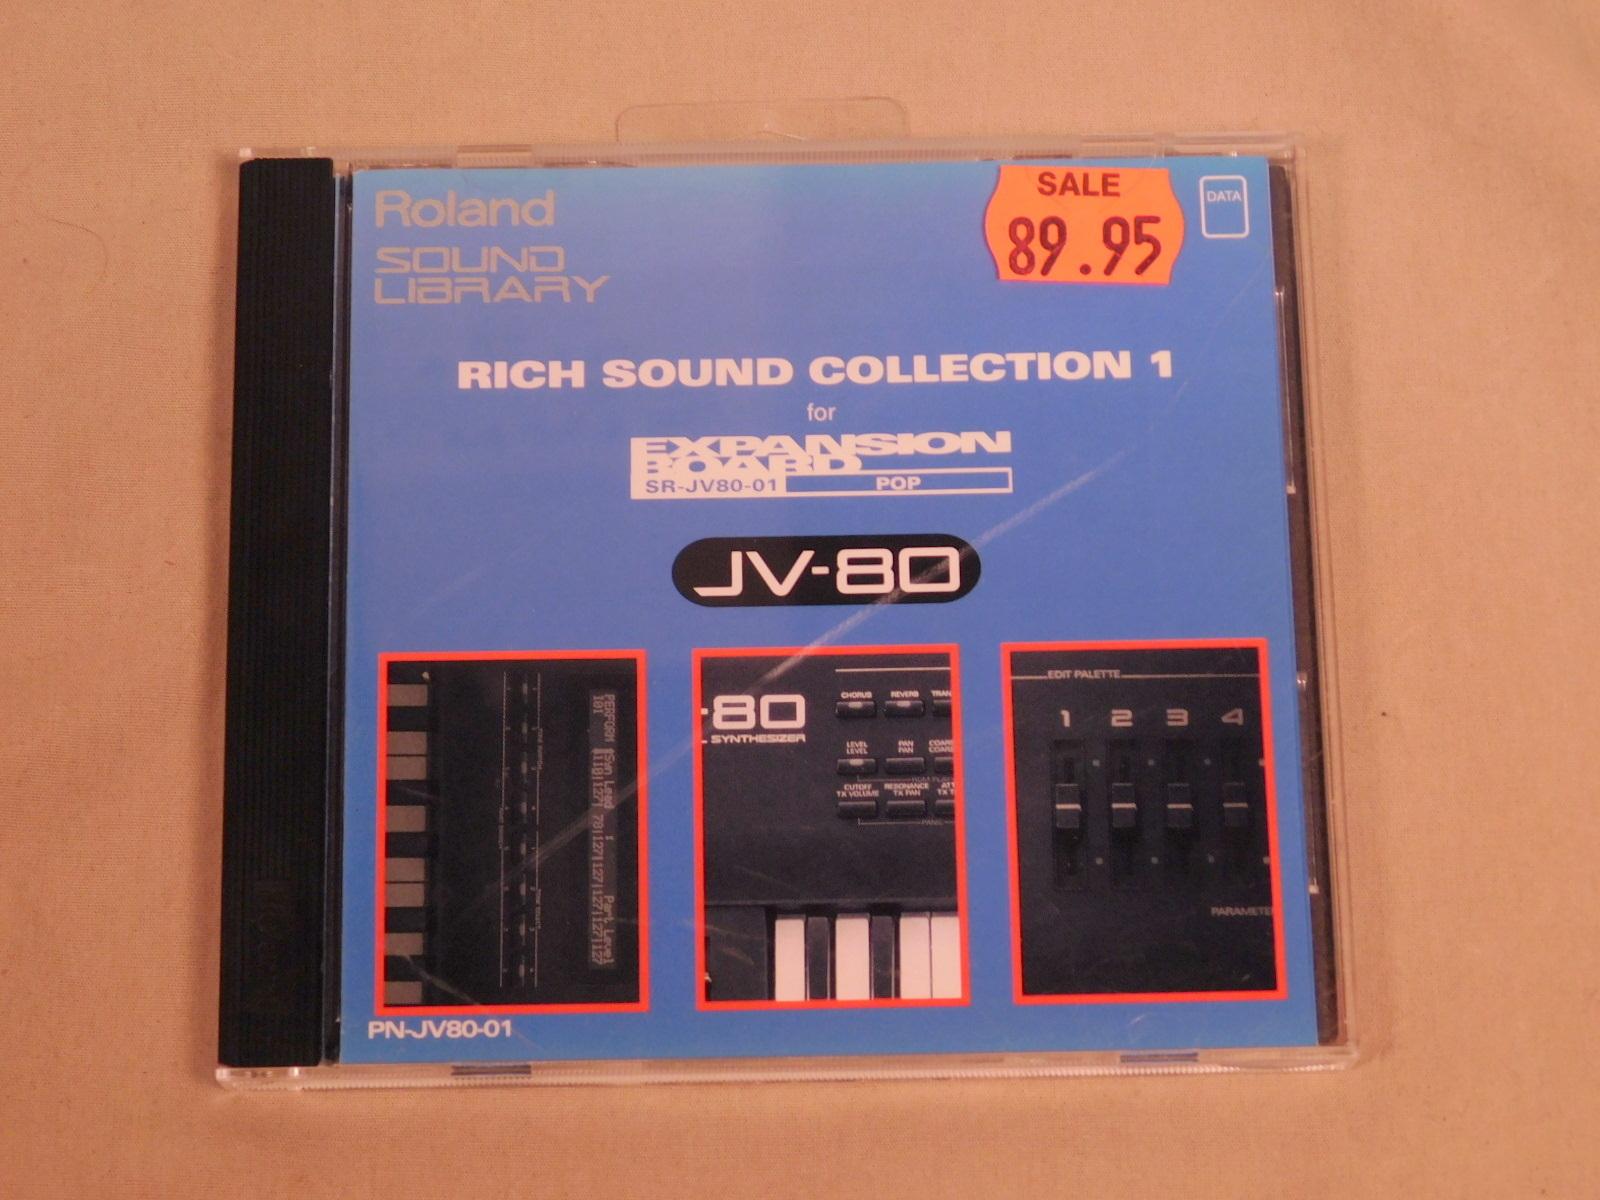 ROLAND SR-JV80-01 RICH SOUND COLLECTION 1 ONE EXPANSION BOARD FOR JV-80